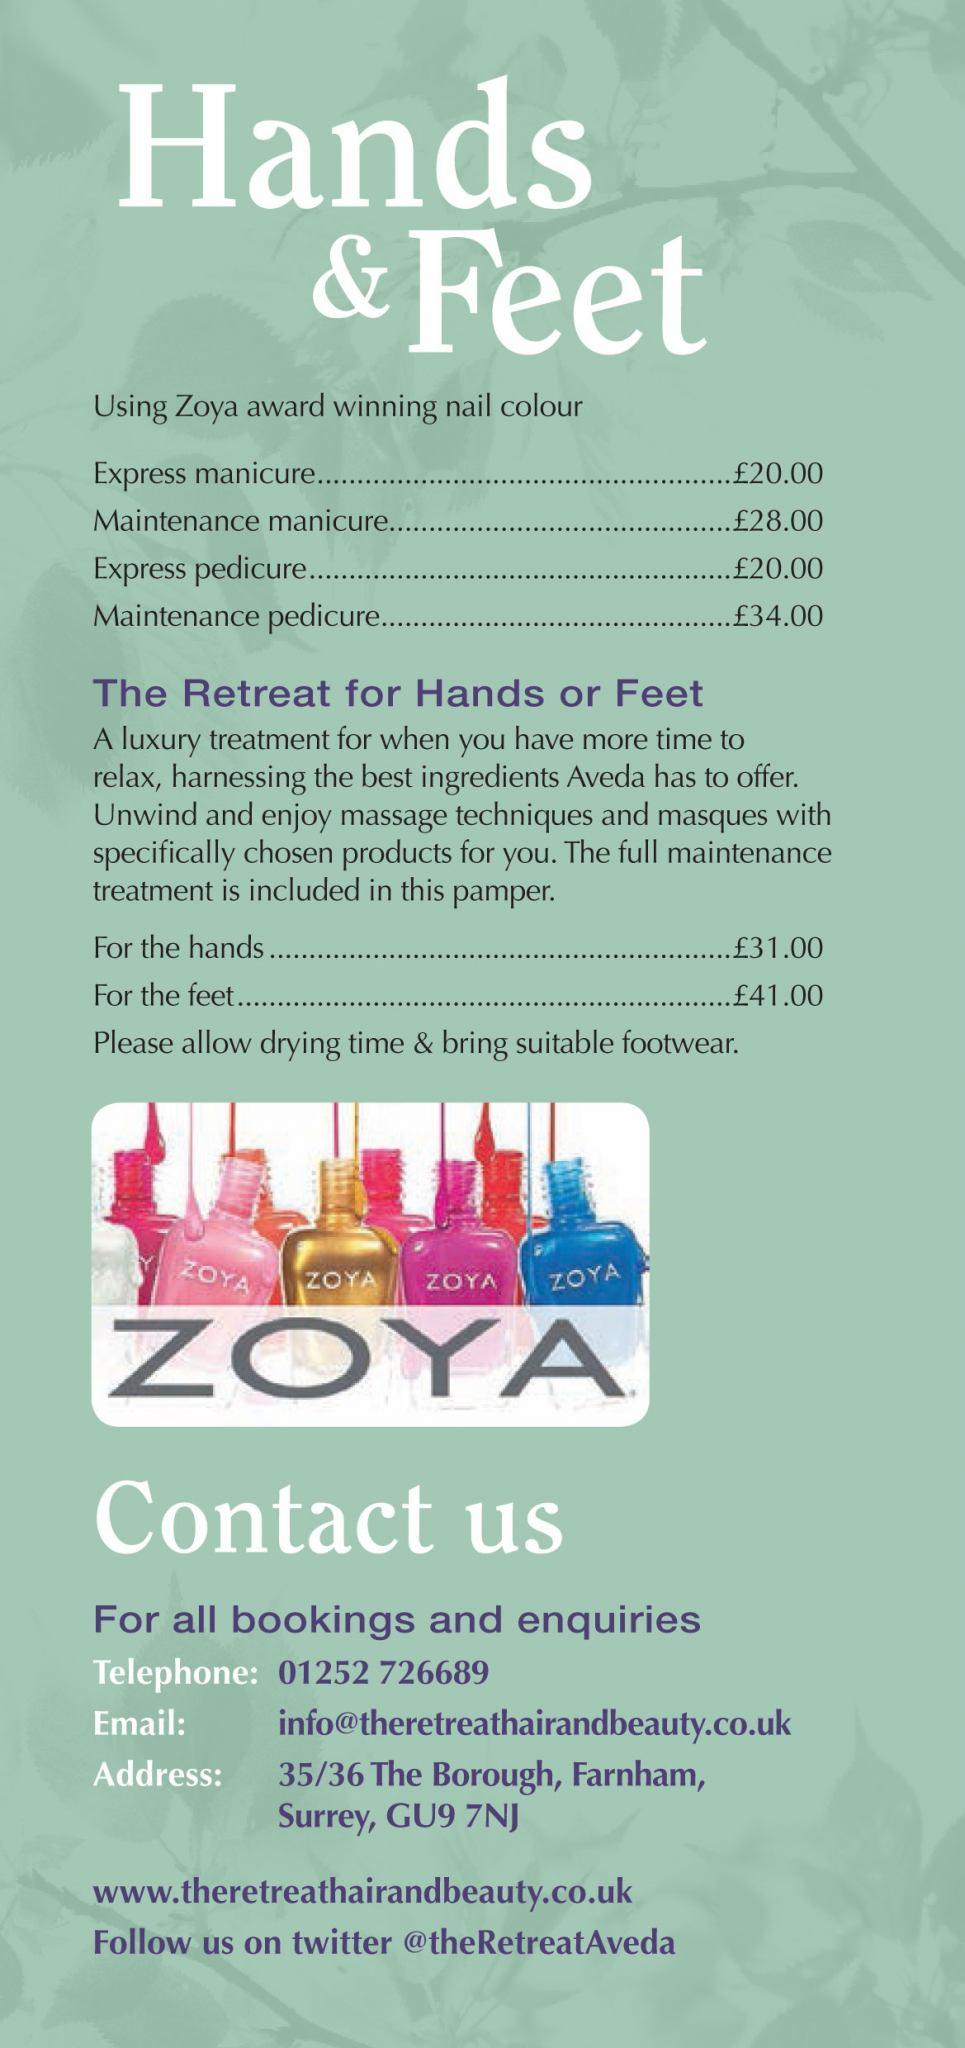 Manicures & Pedicures Aveda Spa, Salon Farnham